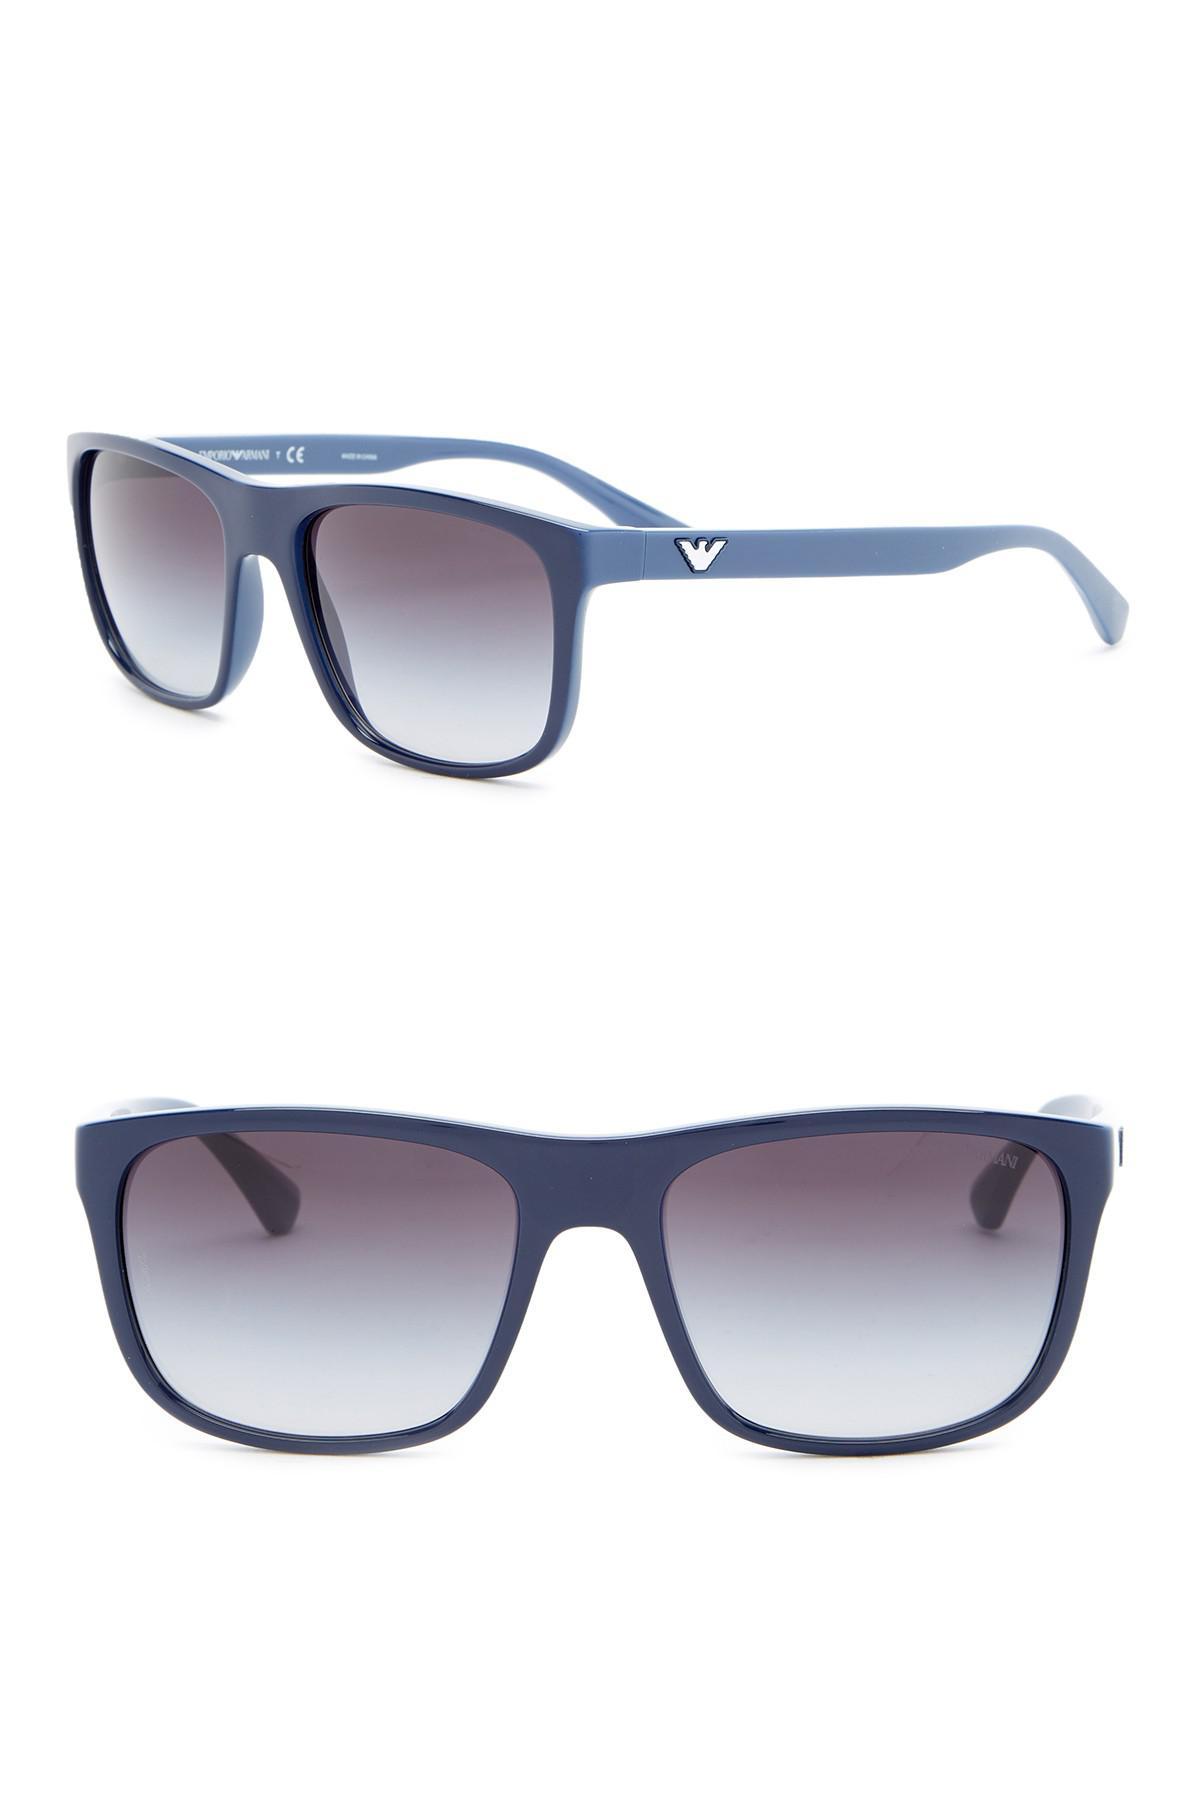 0e74b5586284 Lyst - Emporio Armani 56mm Wayfarer Acetate Frame Sunglasses in Blue ...